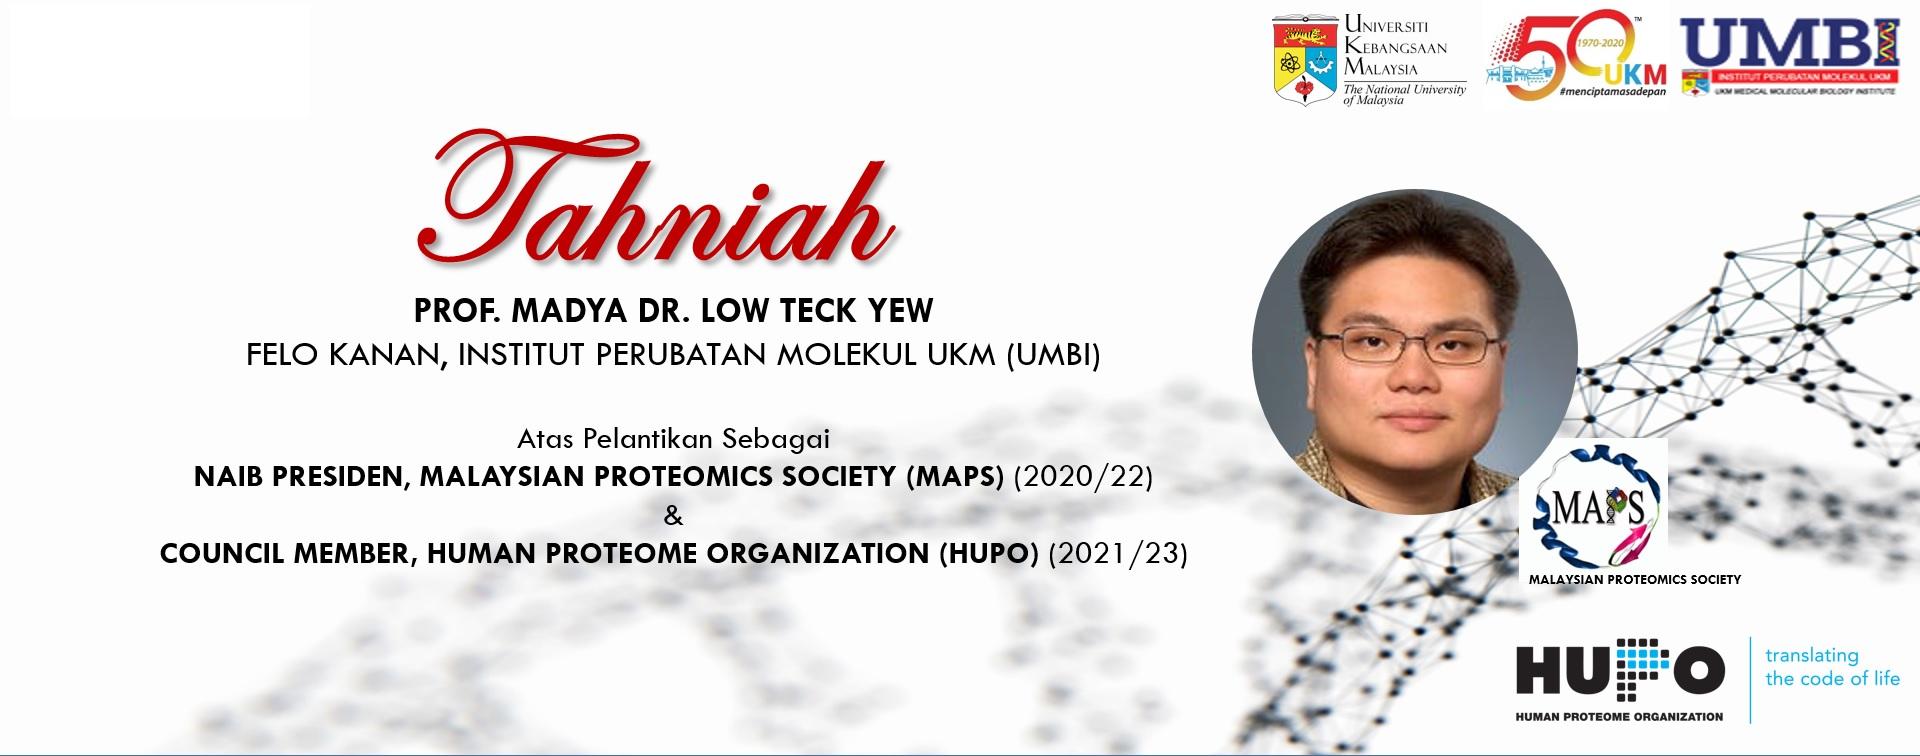 UCAPAN TAHNIAH PROF. MADYA DR. LOW TECK YEW